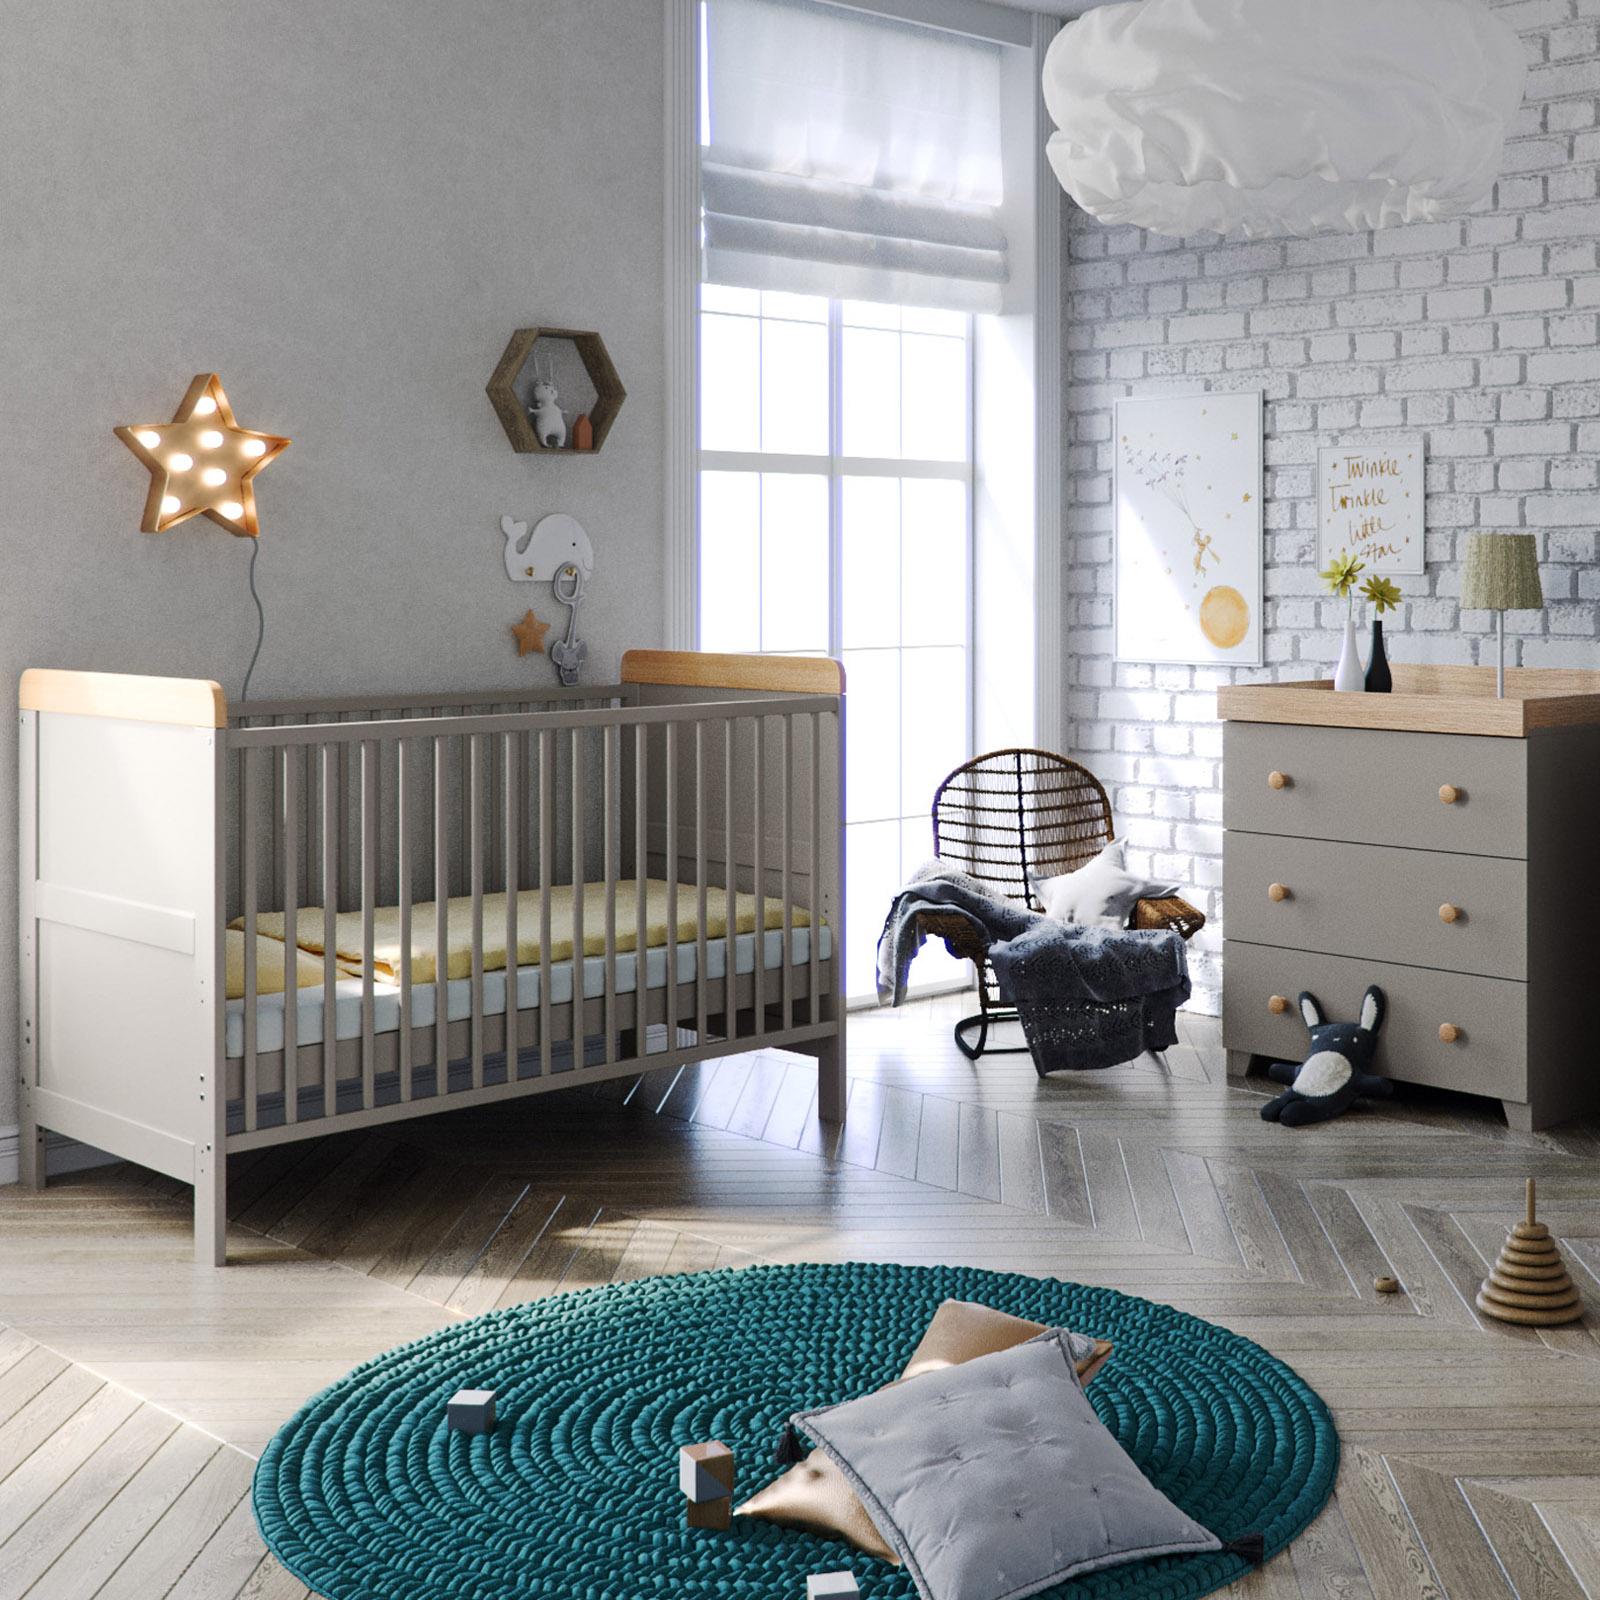 Little Acorns Classic Milano Cot Bed 4 Piece Nursery ...